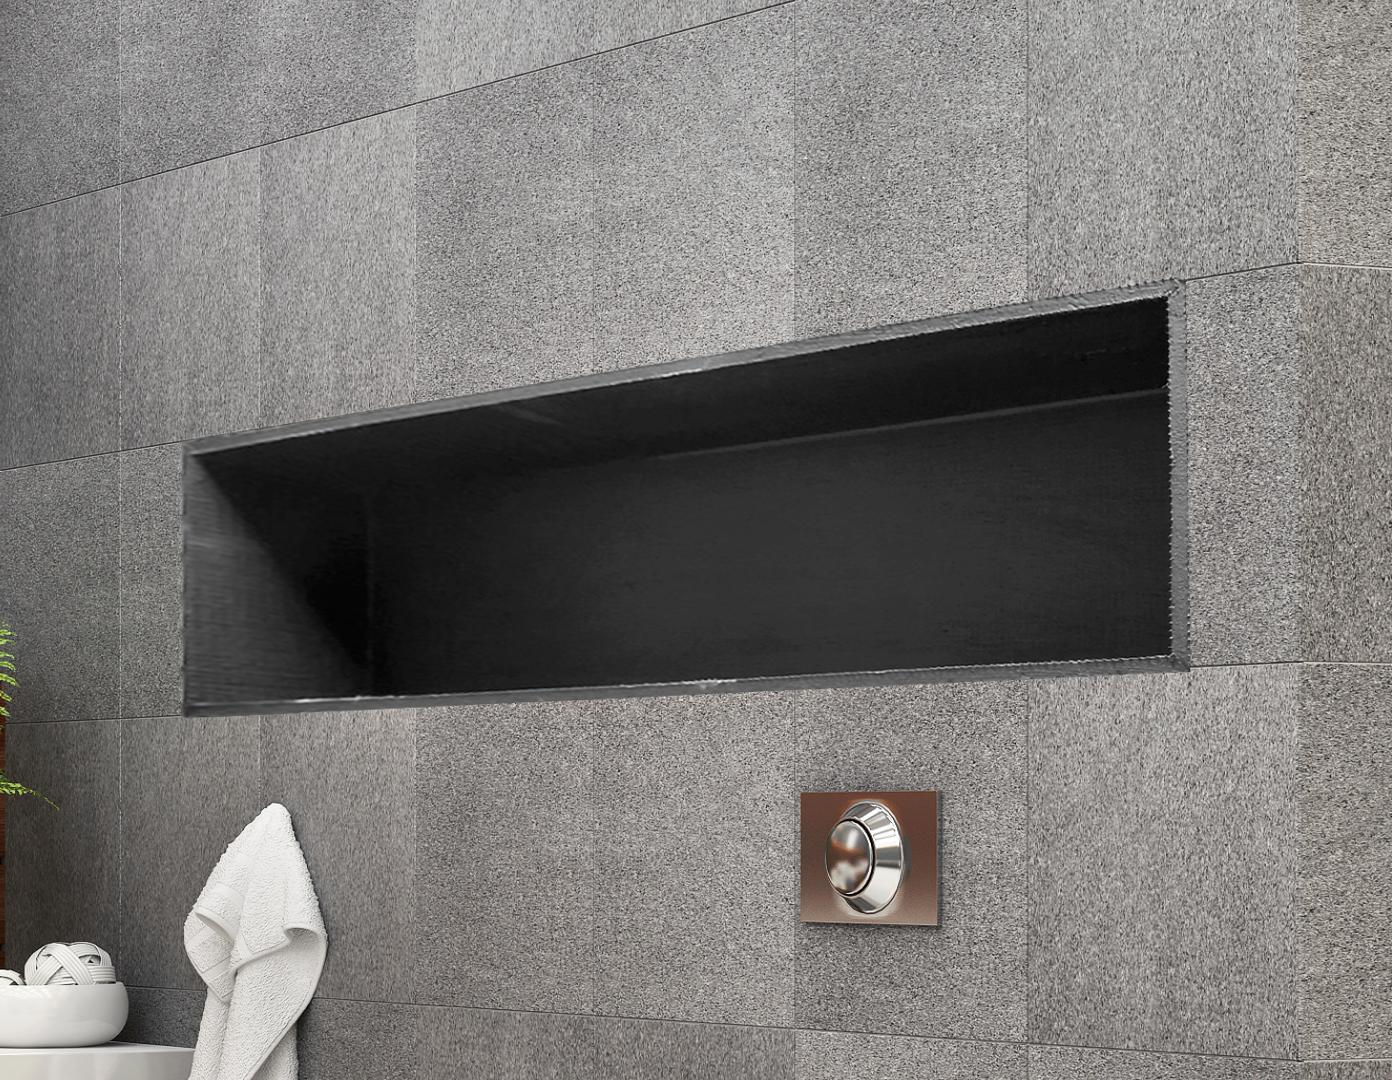 shower niche 250 x 900 x 92mm prefabricated wall bathroom renovation